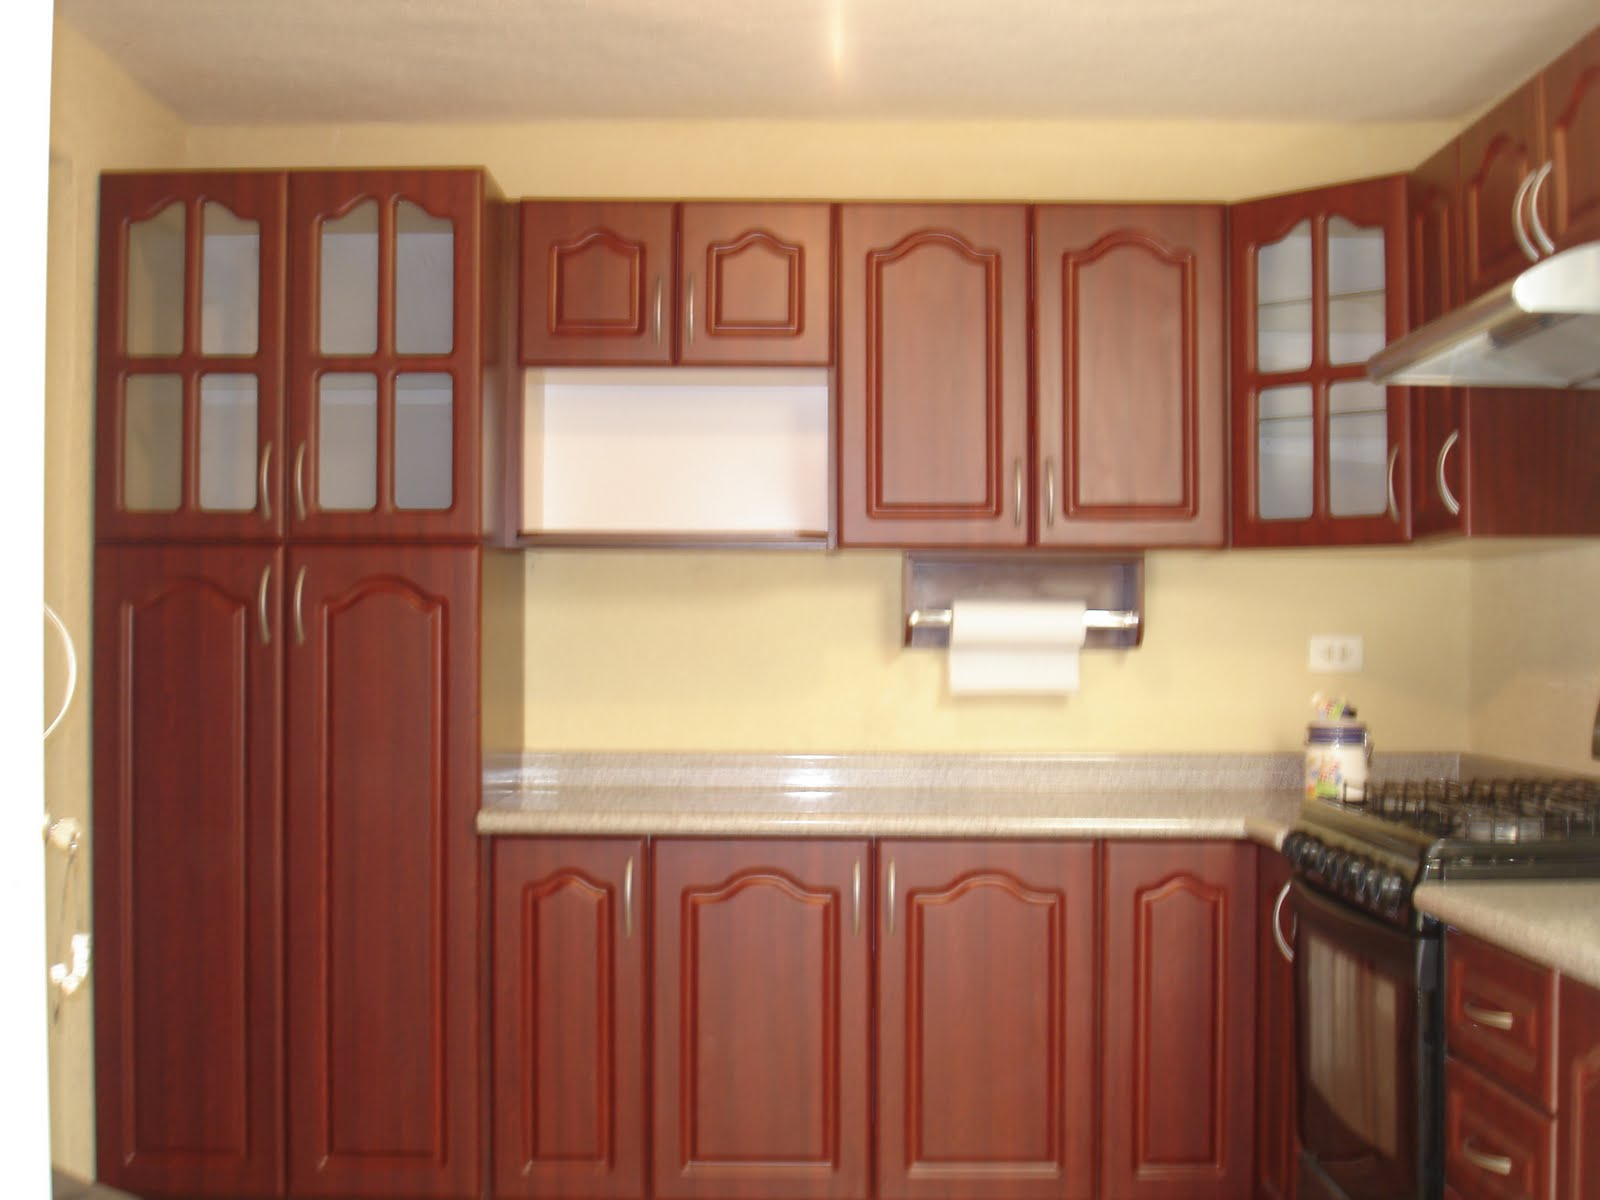 Construteksa gabinetes de cocina for Estilos de gabinetes de cocina modernos